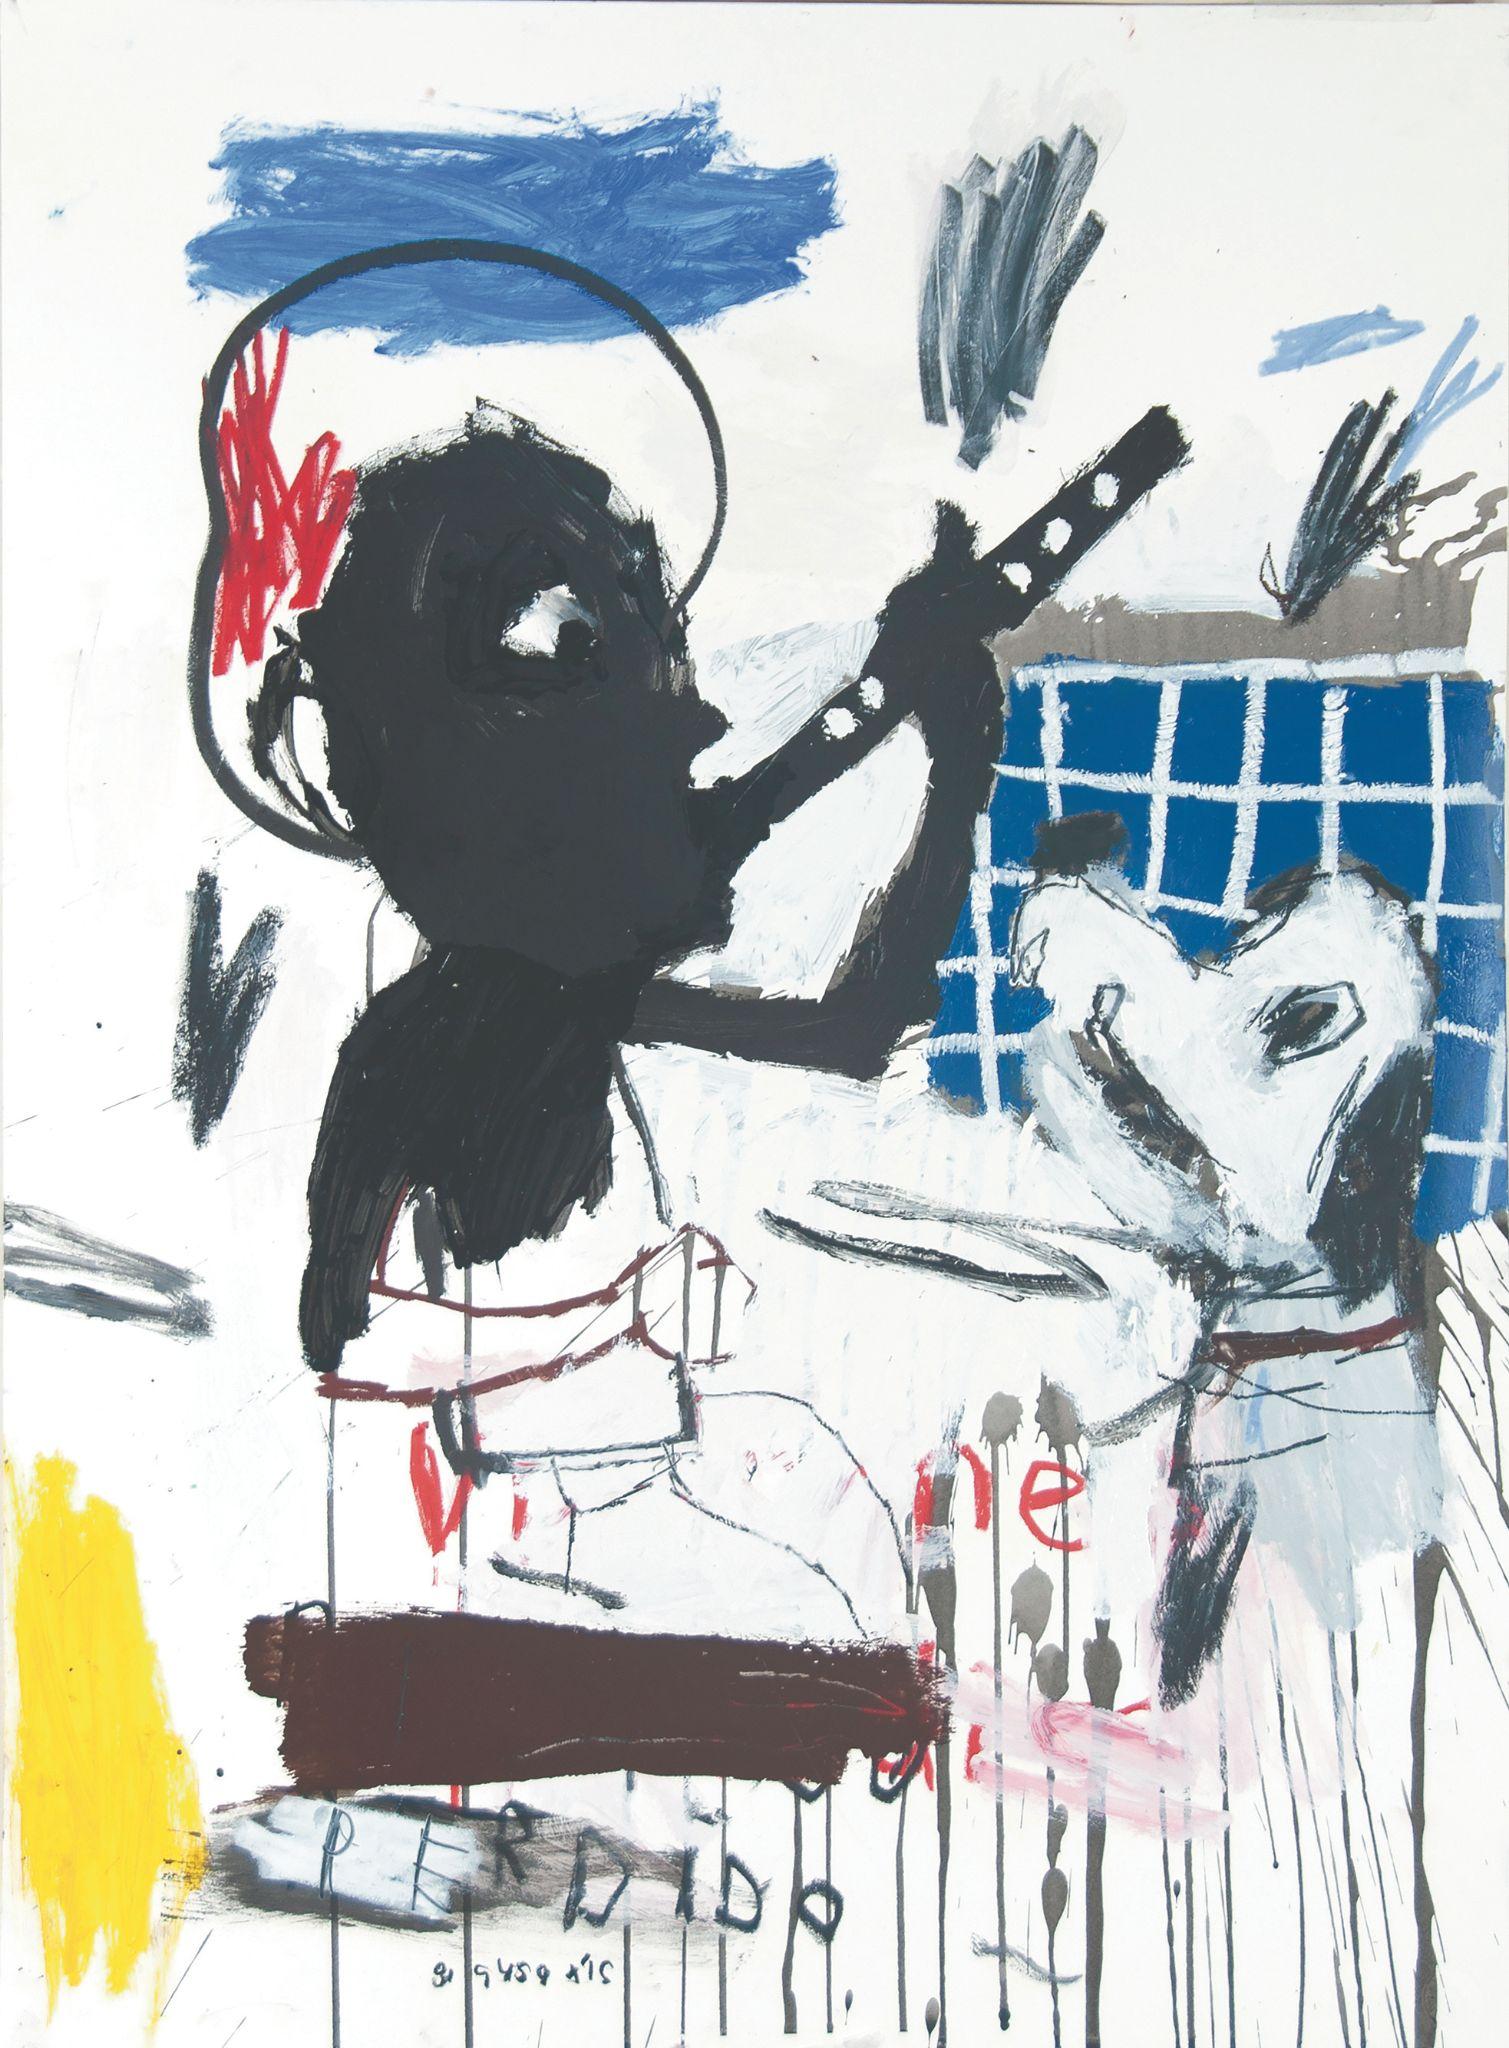 Starsky Brines Biography Art Collection Online For Sale On Kooness